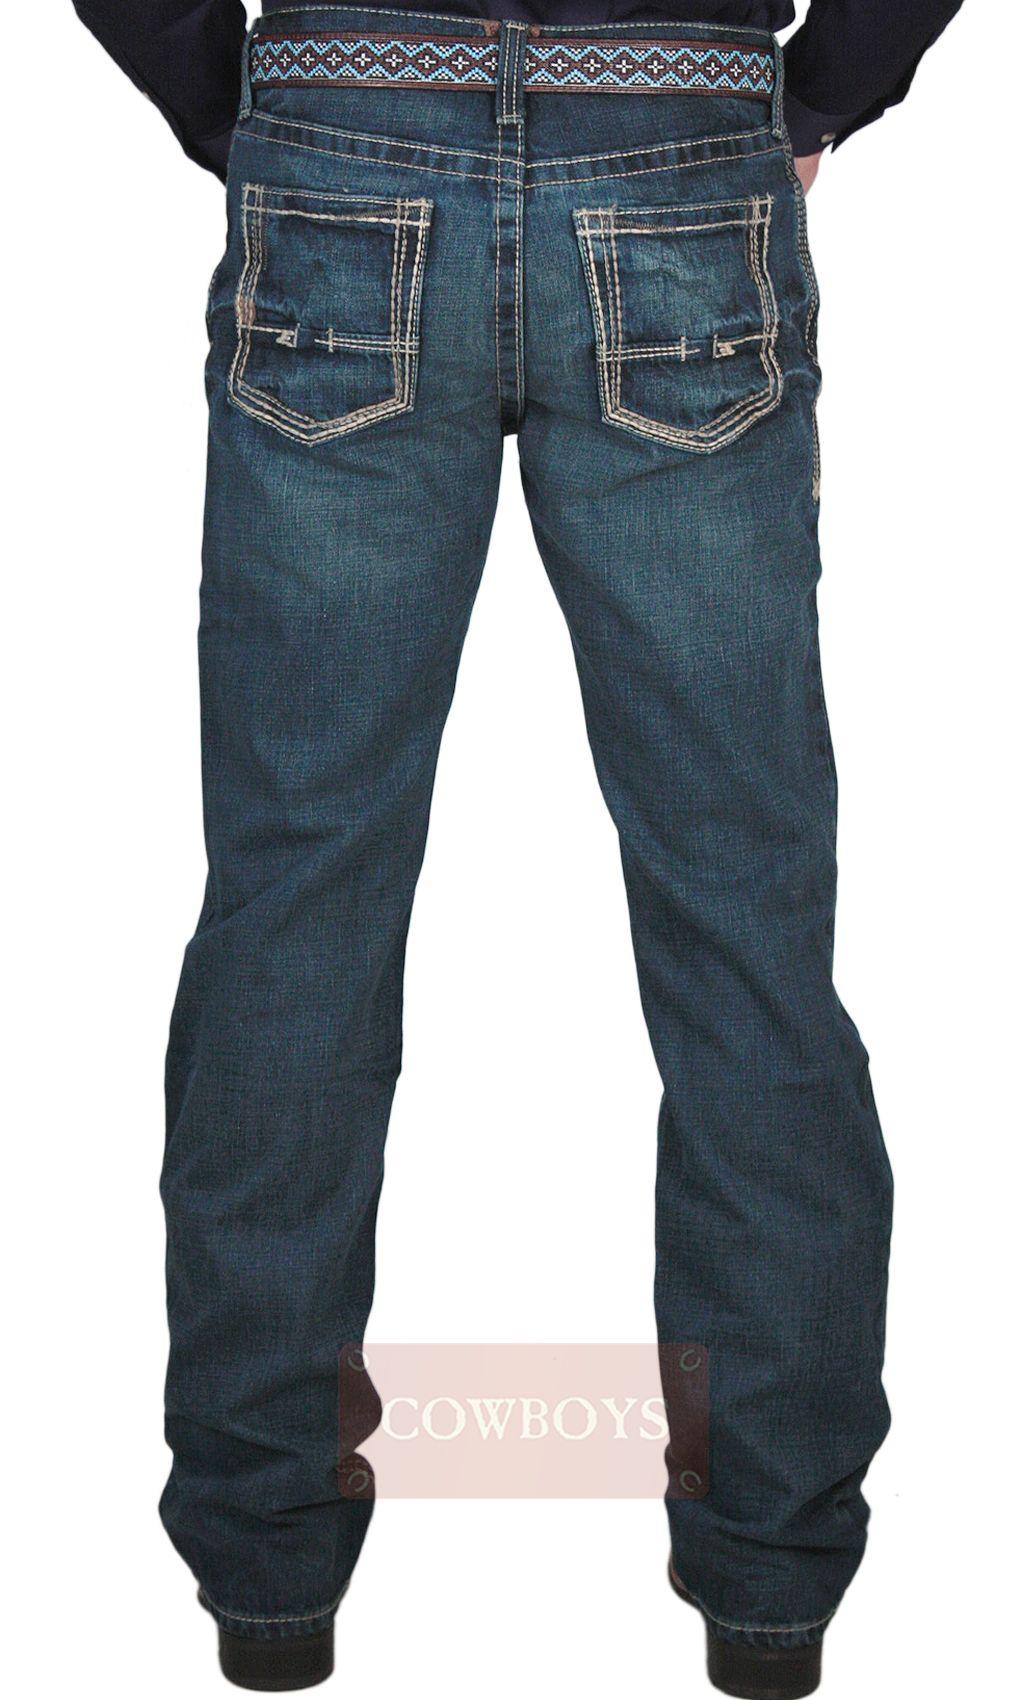 74302f0b7 Calça Jeans Masculina Ariat Relaxed Low Rise Fashion Boot Cut Calça  Masculina importada da marca Ariat. Jeans 100% algodão cor azul Stonado.